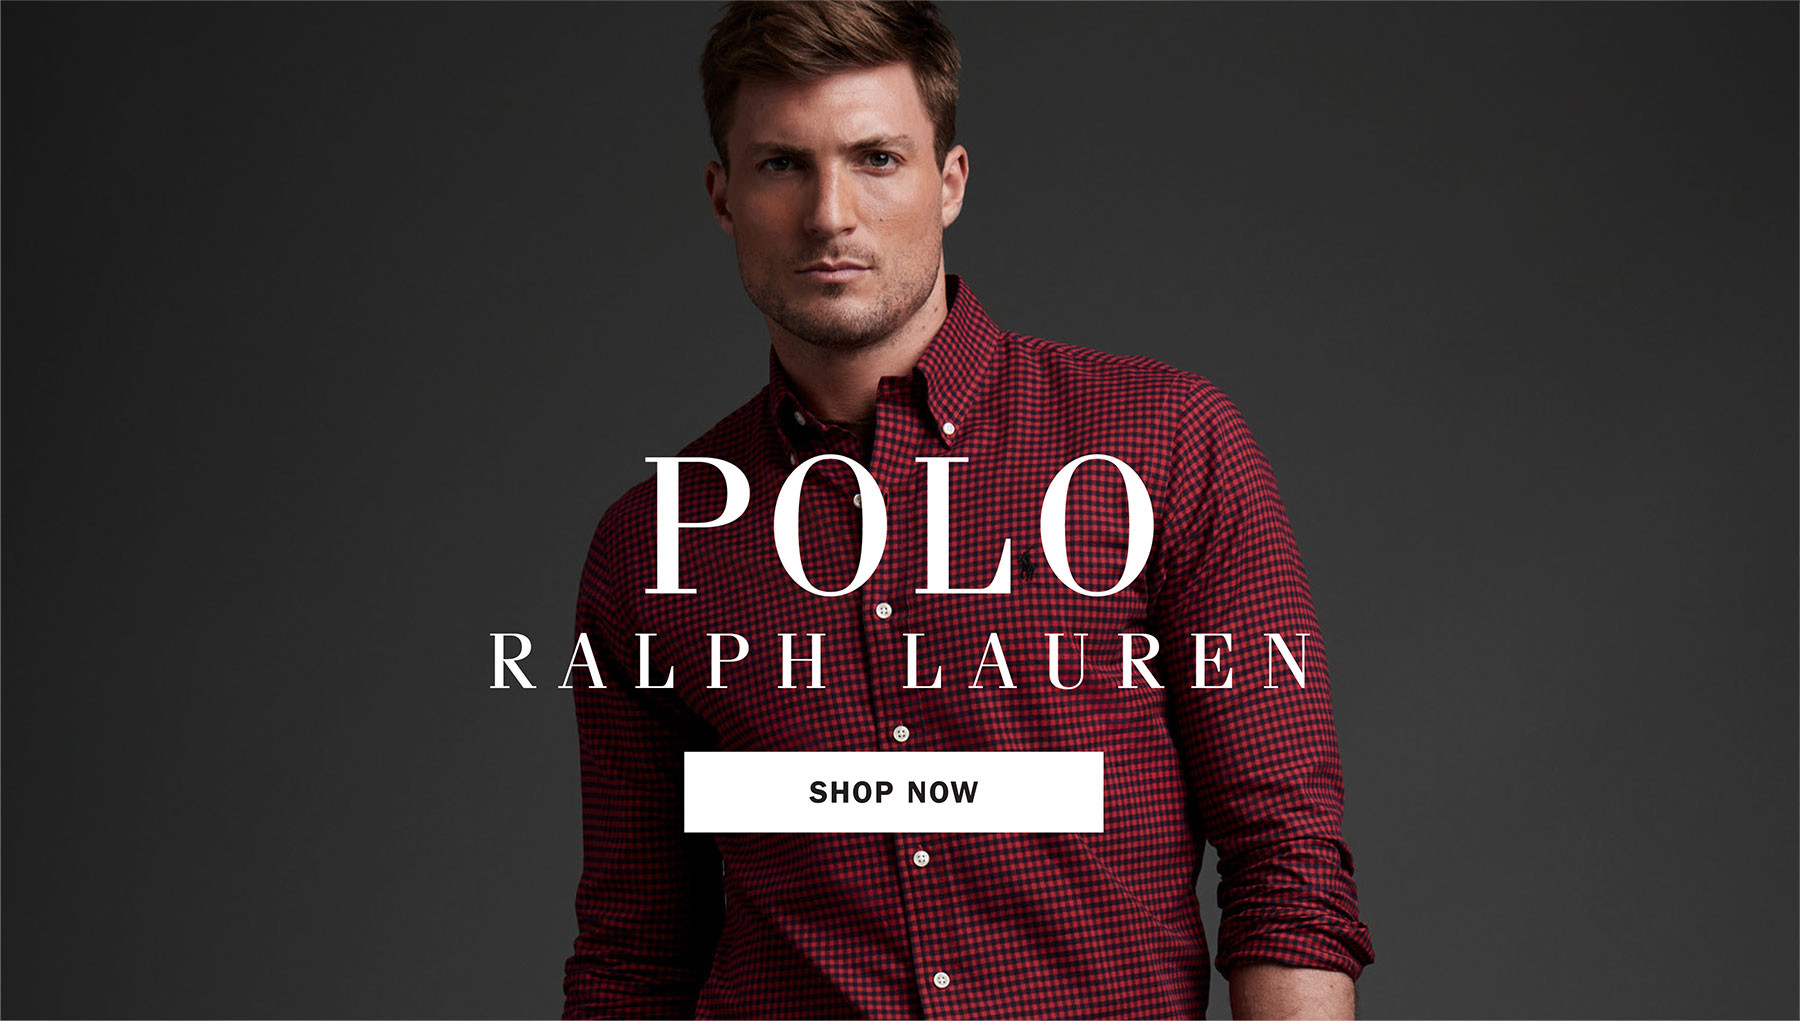 POLO RALPH LAUREN   SHOP NOW